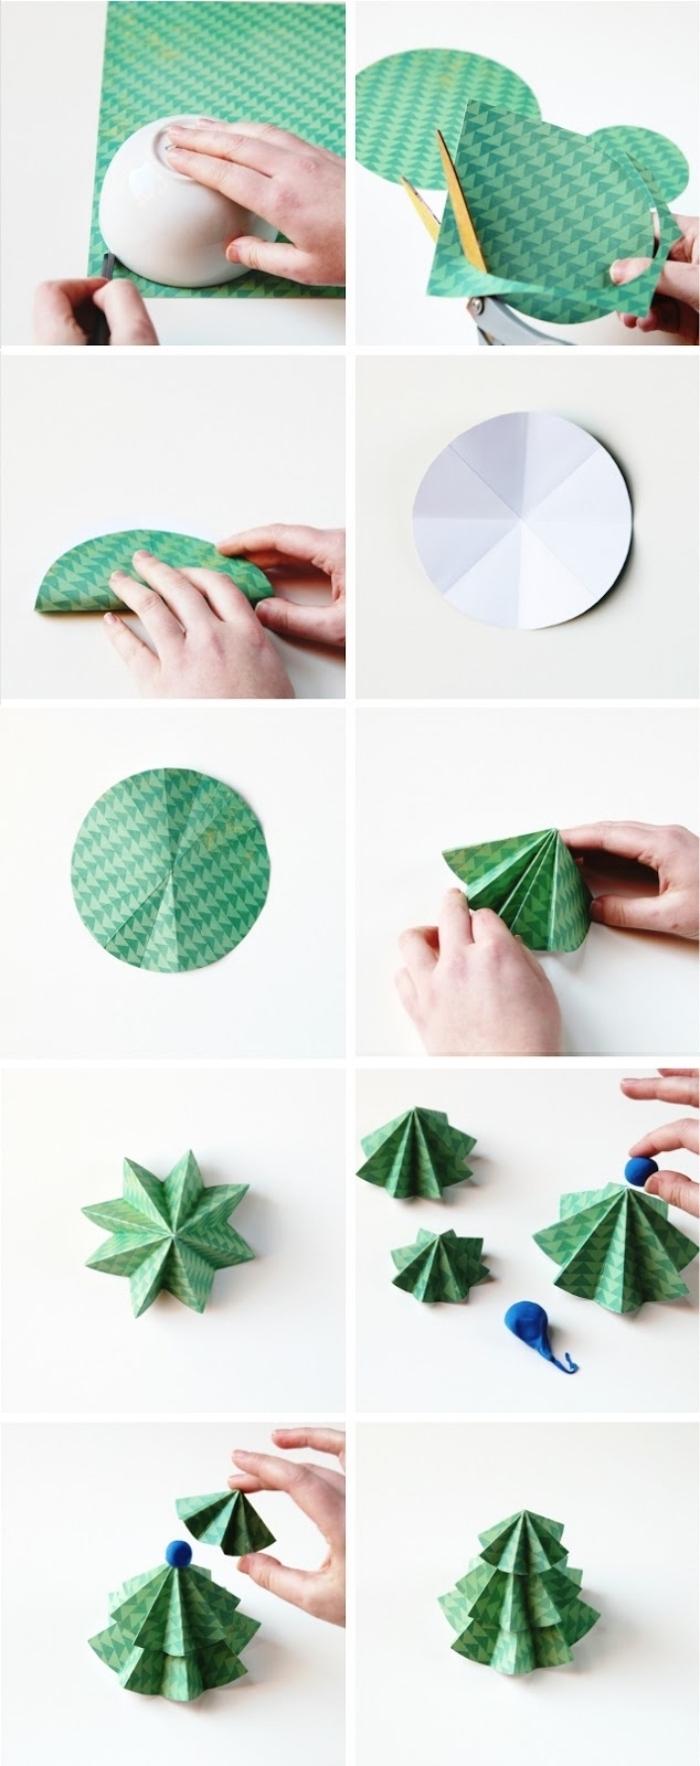 Deco Noel A Fabriquer En Papier Fabriquer Un Sapin De Noel En